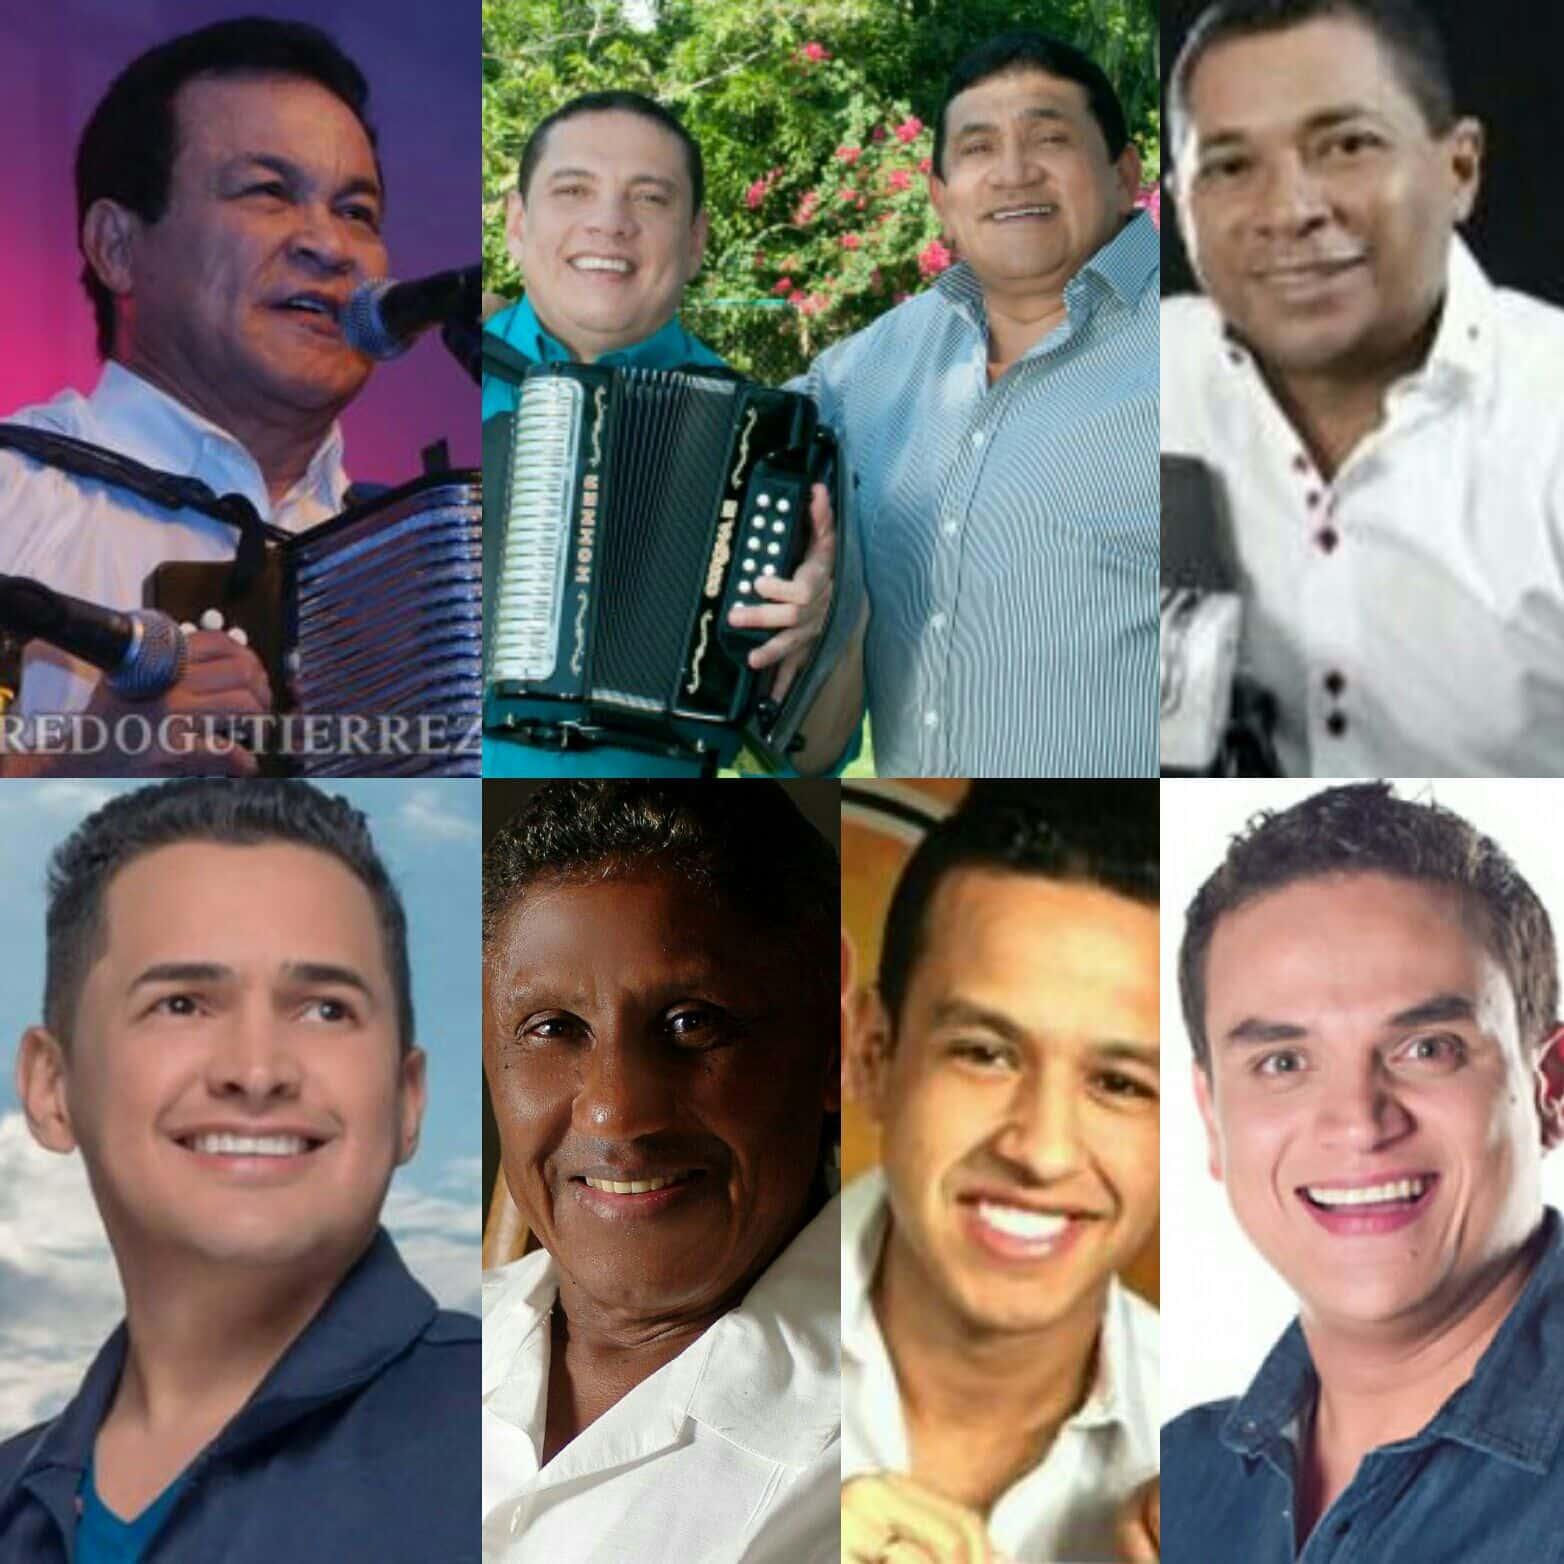 Jorge Celedon, Silvestre Dangond, El Gran Martin Elías, Silvio Brito, Poncho Zuleta y Alfredo Gutiérrez